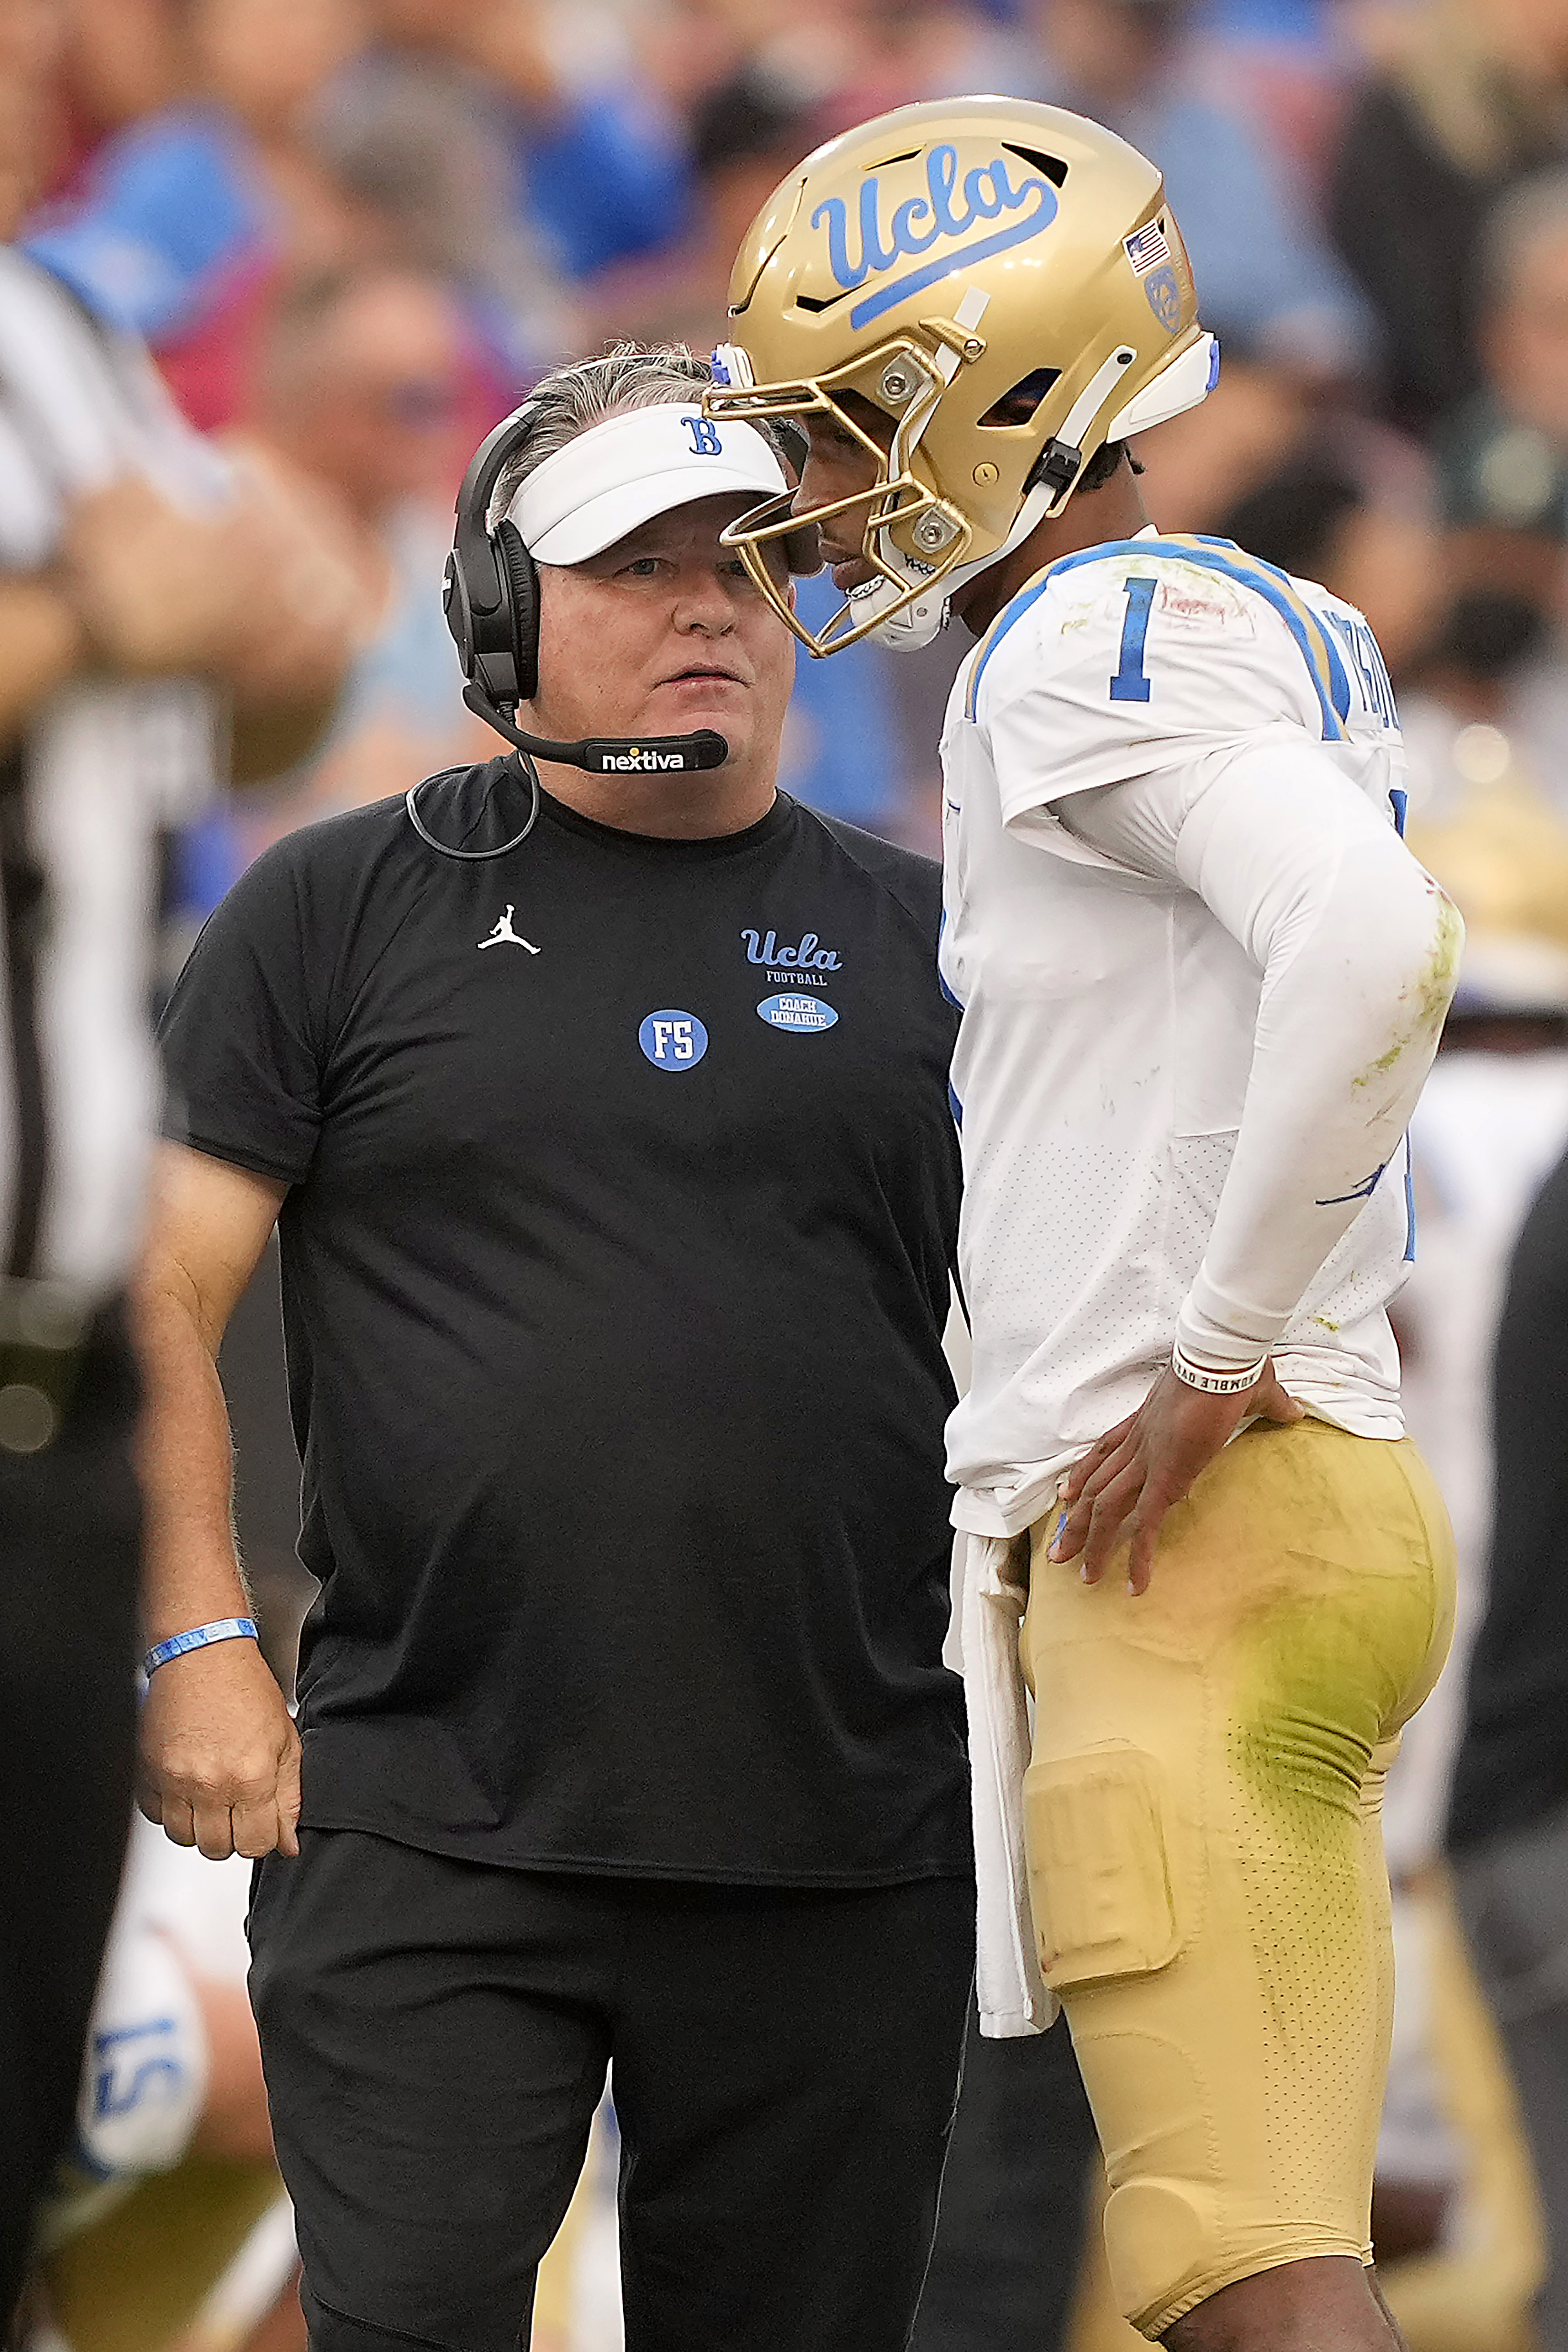 UCLA coach Chip Kelly, left, talks to quarterback quarterback Dorian Thompson-Robinson (1) during a game against Stanford Saturday.